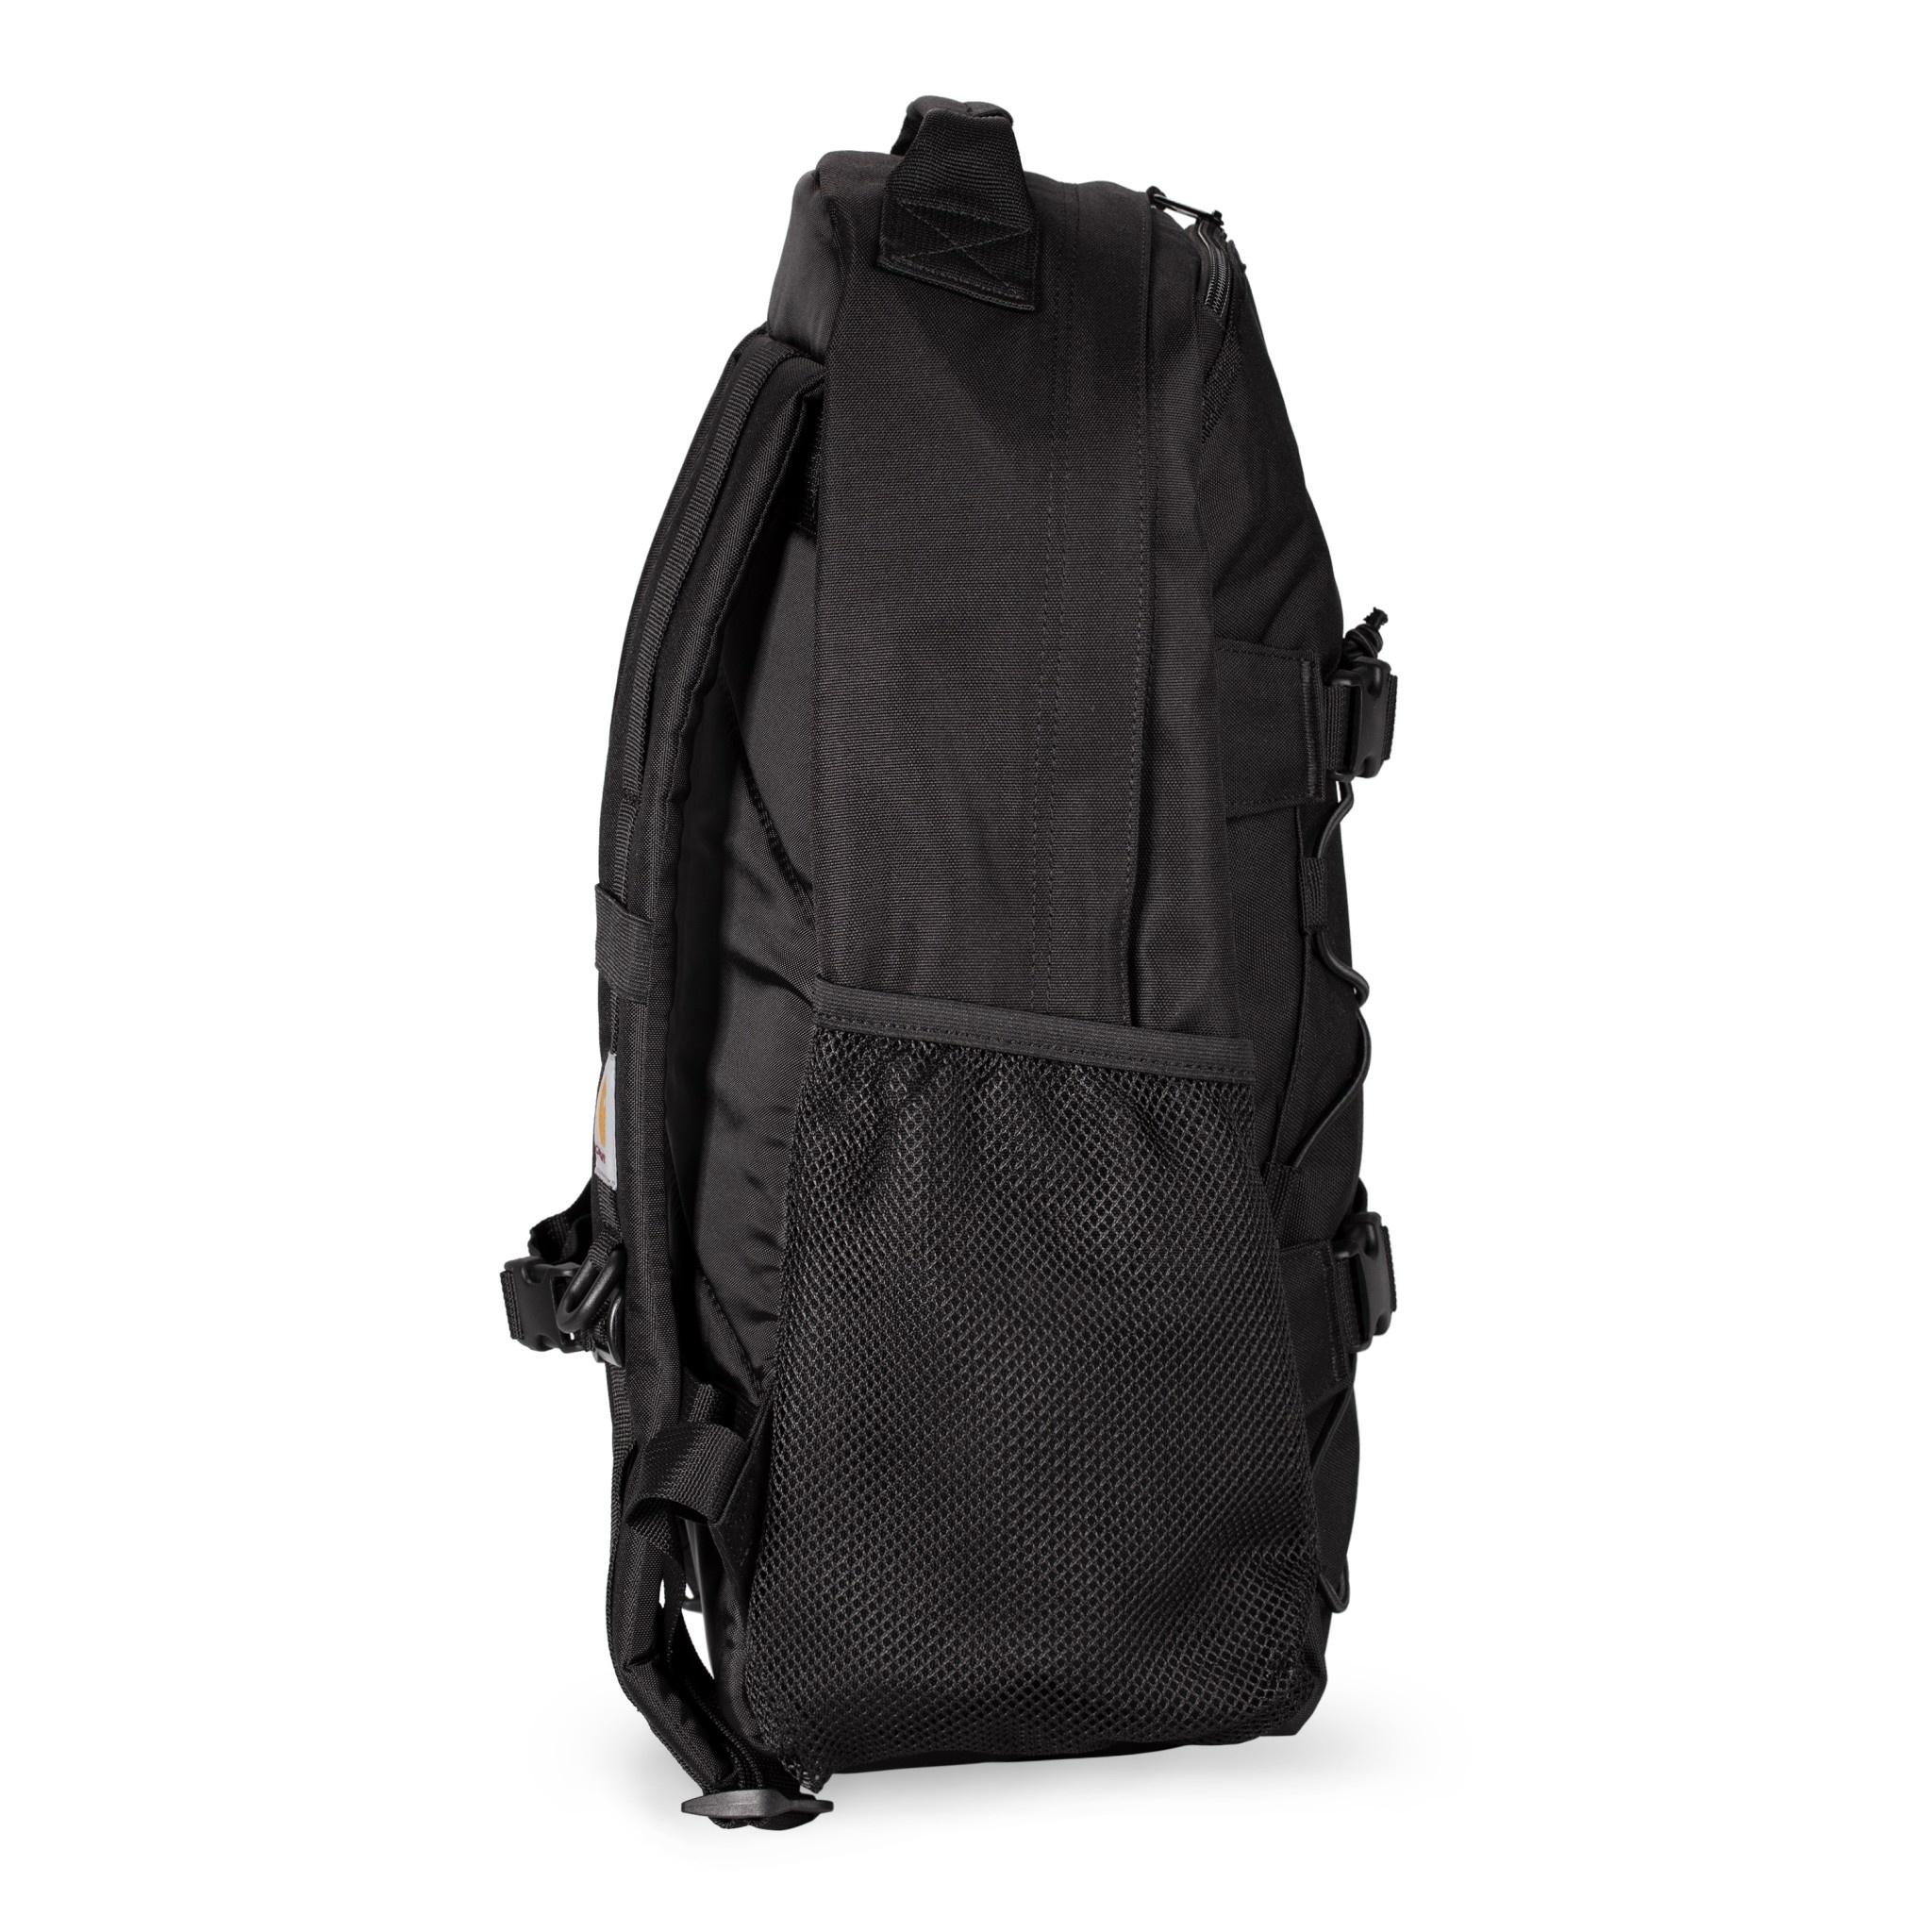 Carhartt Work In Progress Kickflip Backpack in Black